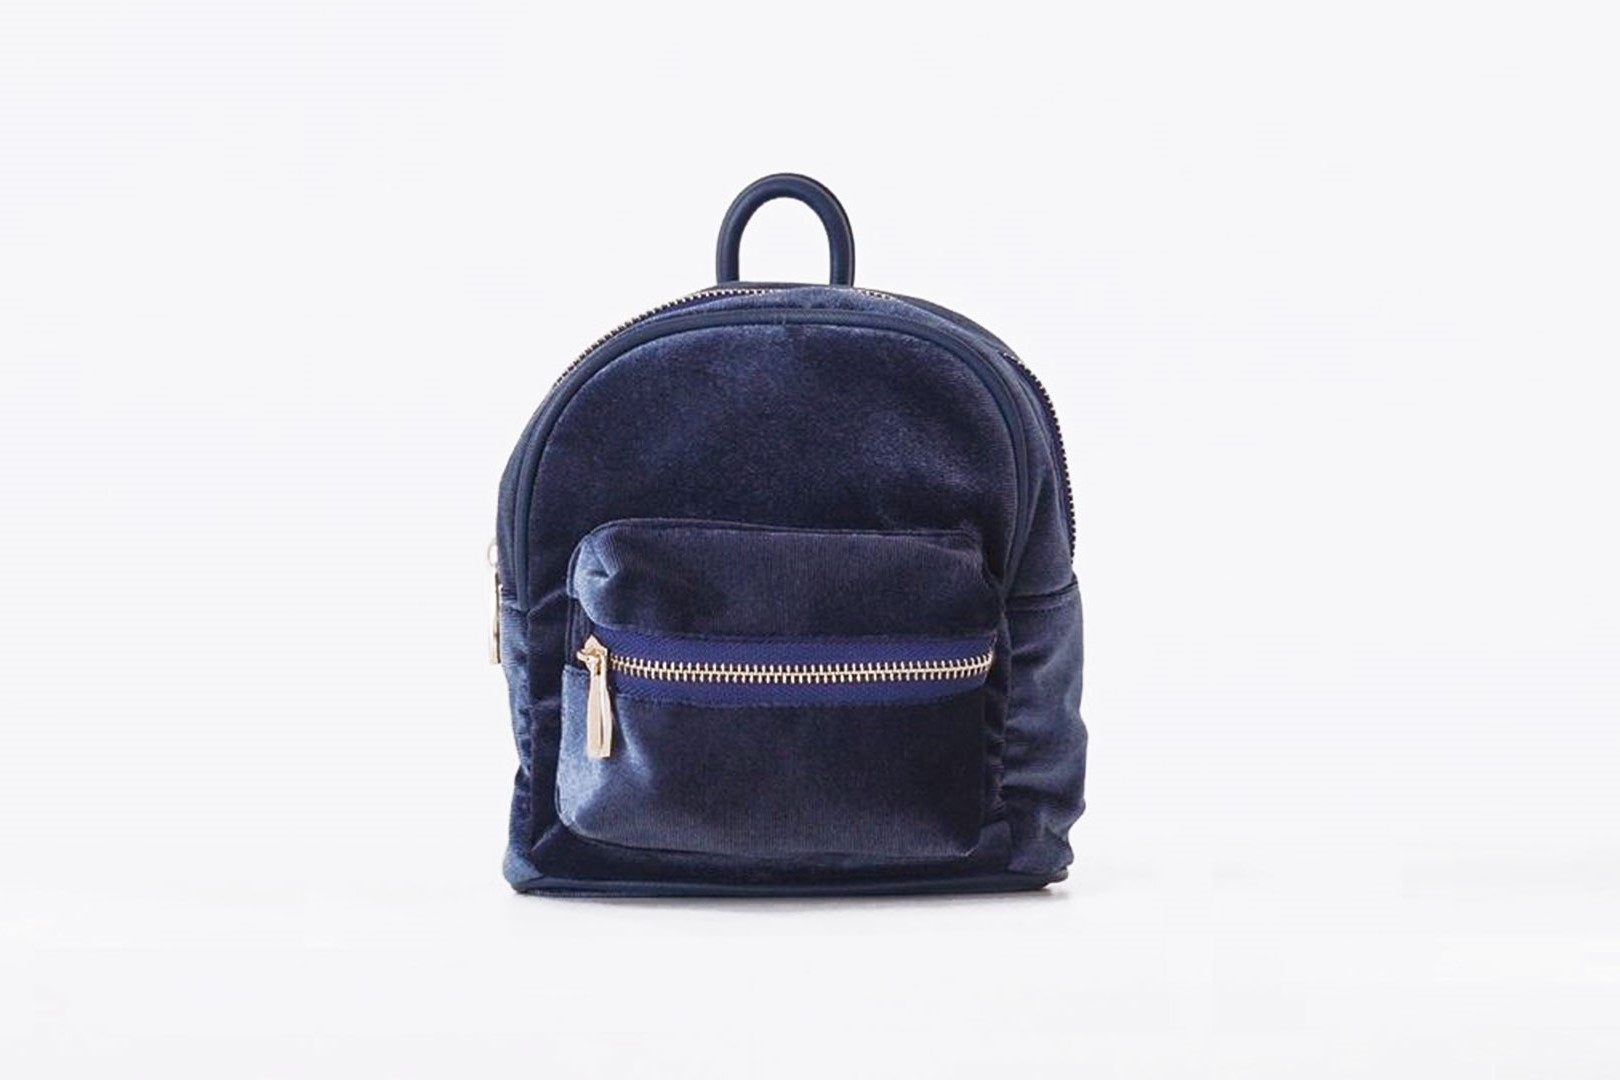 #PopbelaOOTD: Upgrade Gaya Makin Keren Pakai Backpack dari Brand Lokal